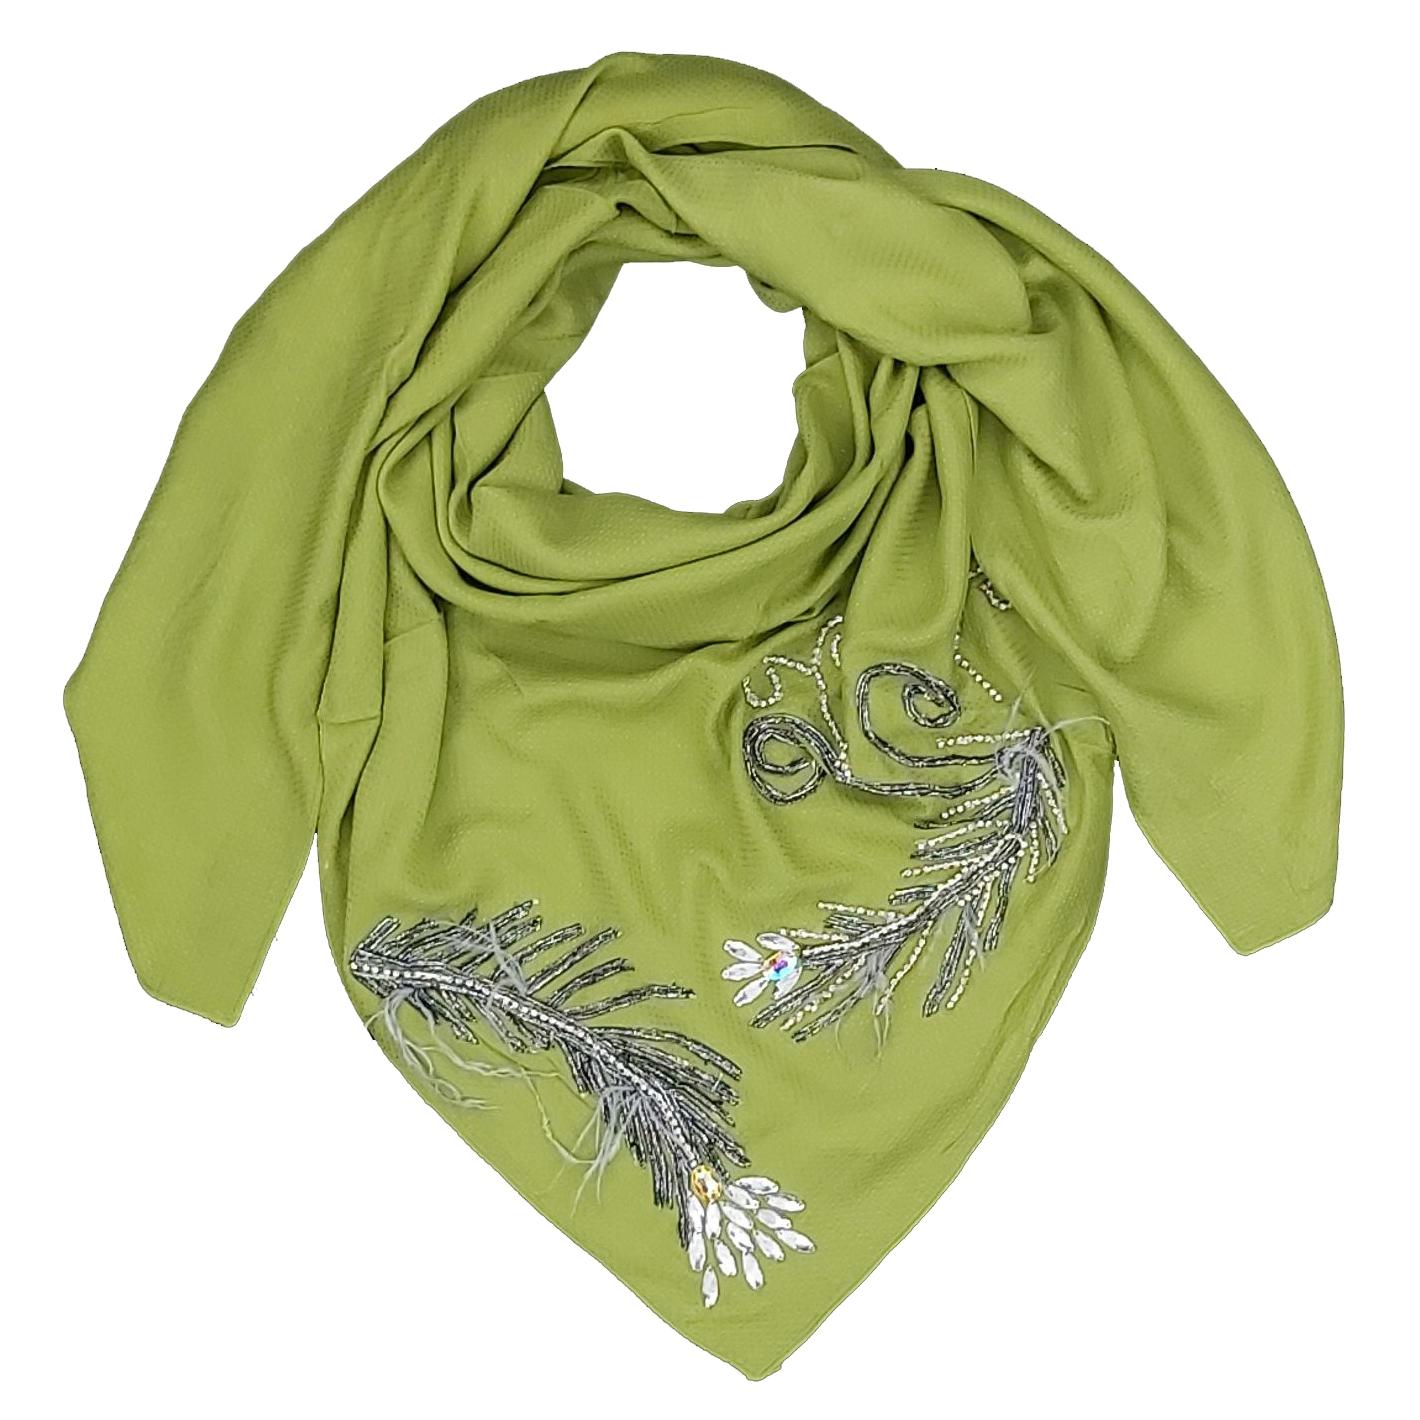 روسری زنانه کد 3001